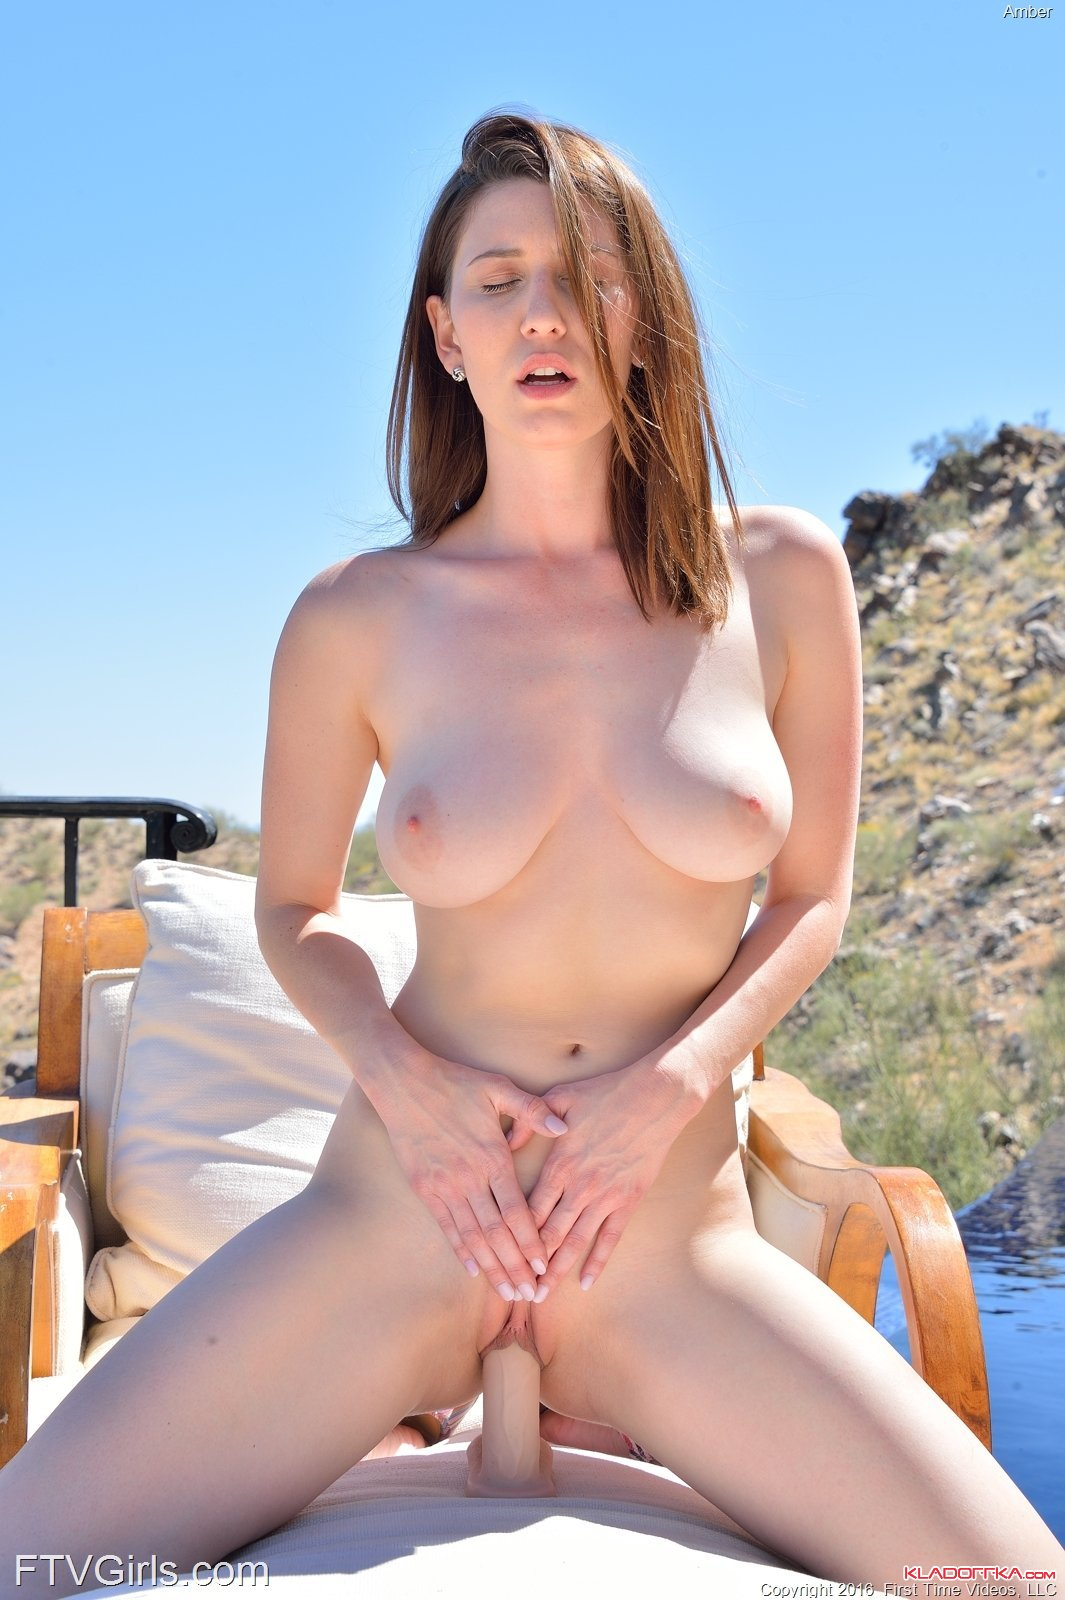 Amber Ftv фото обнаженка и порно